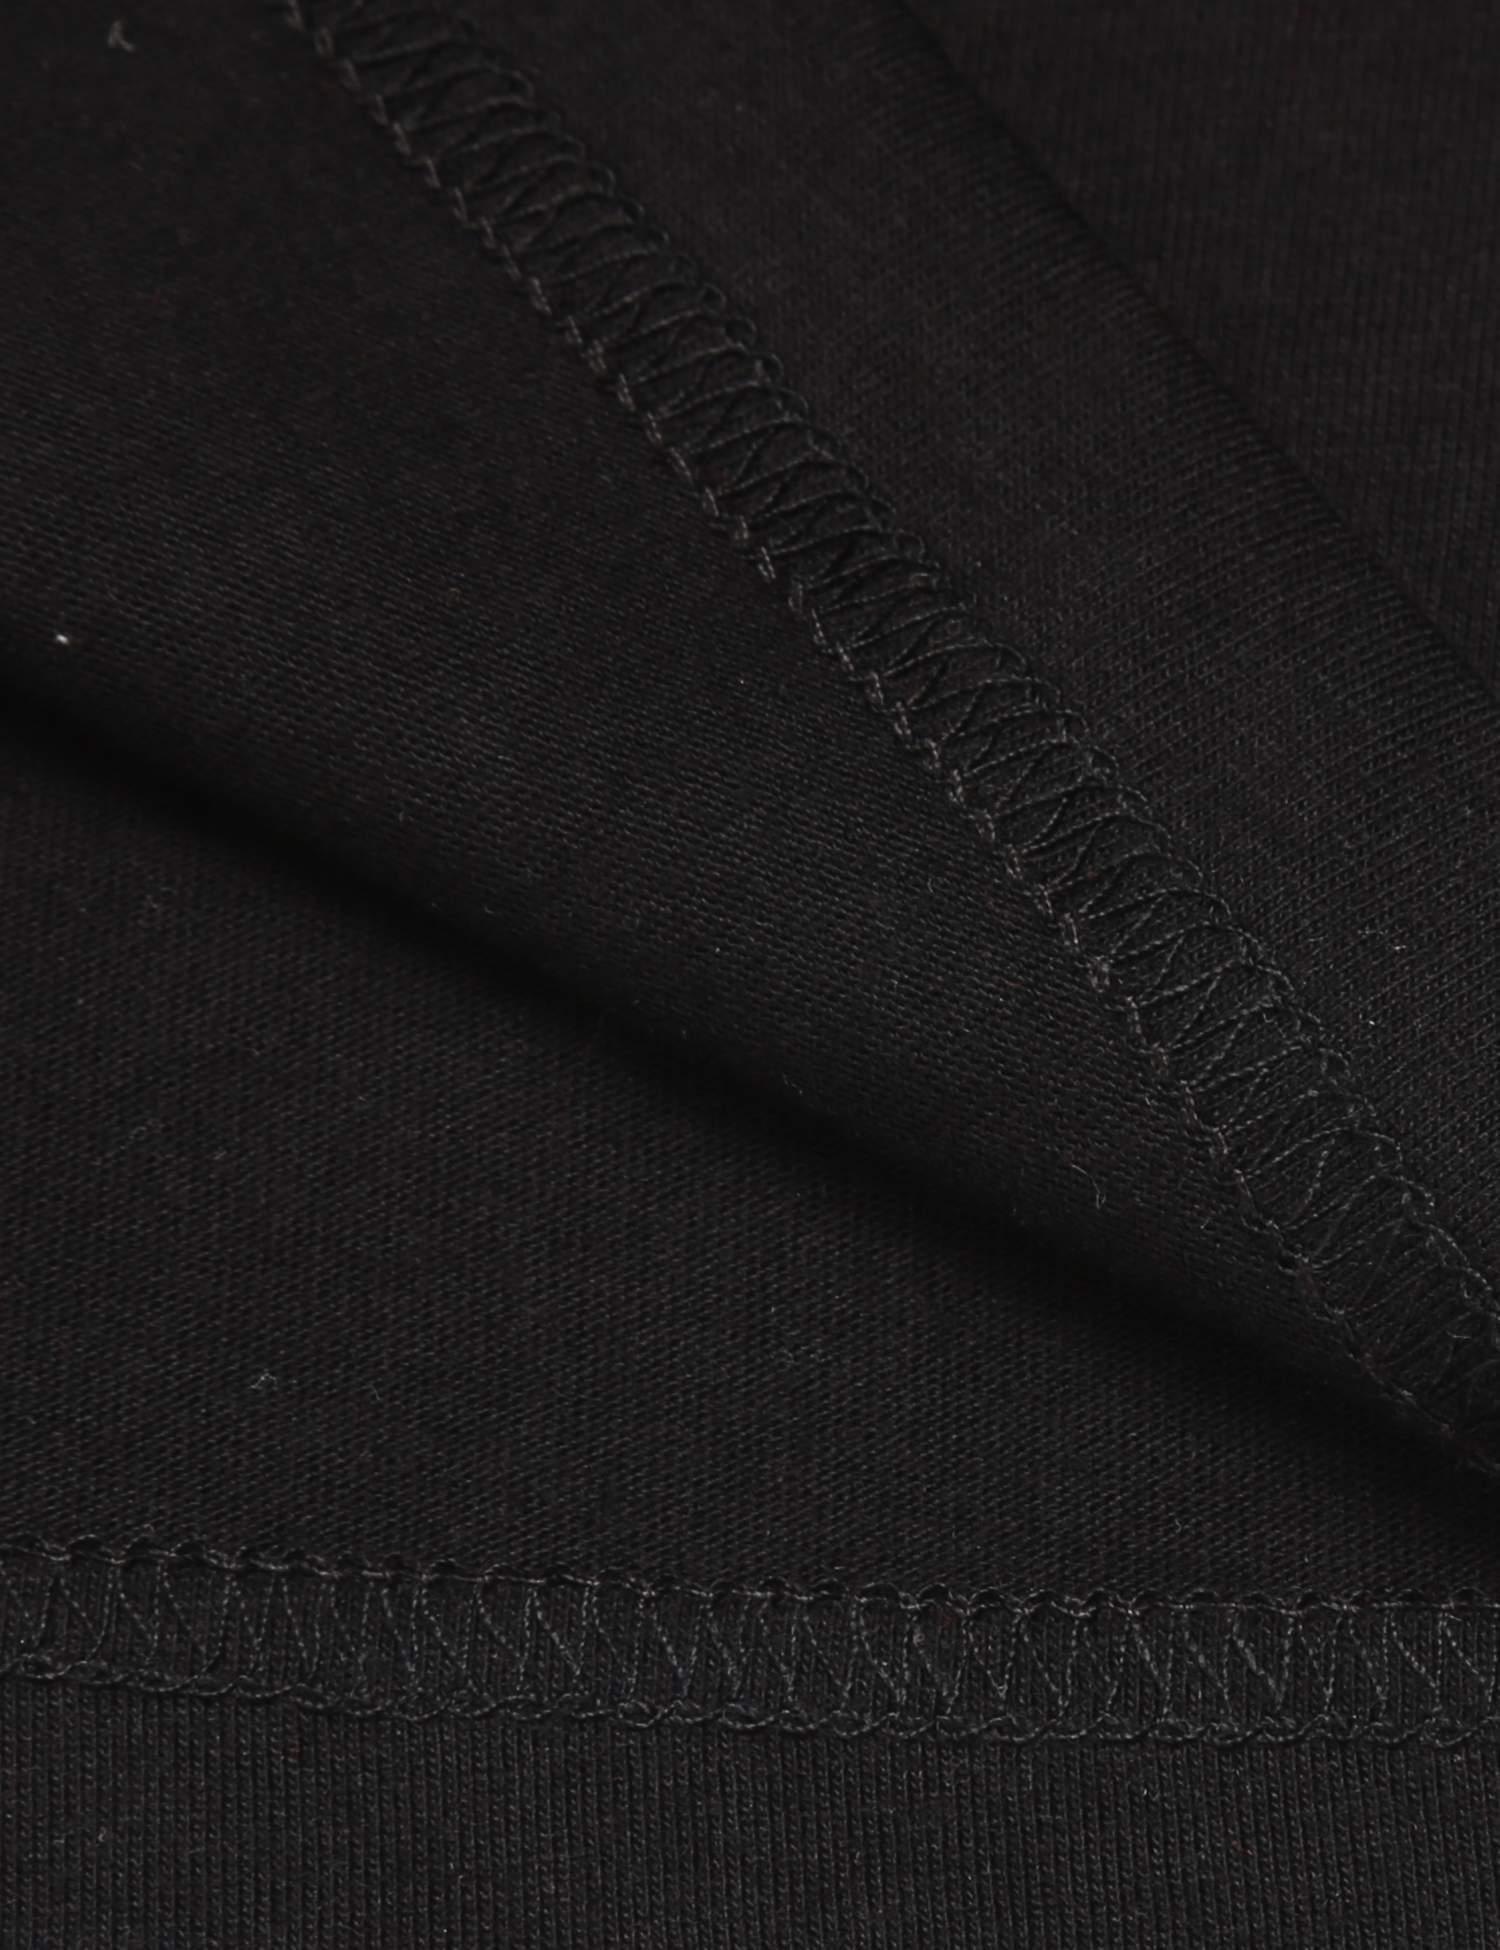 COOFANDY Mens Print Tees Dragon Graphic Long Sleeves Fashion T-Shirts Black L by COOFANDY (Image #7)